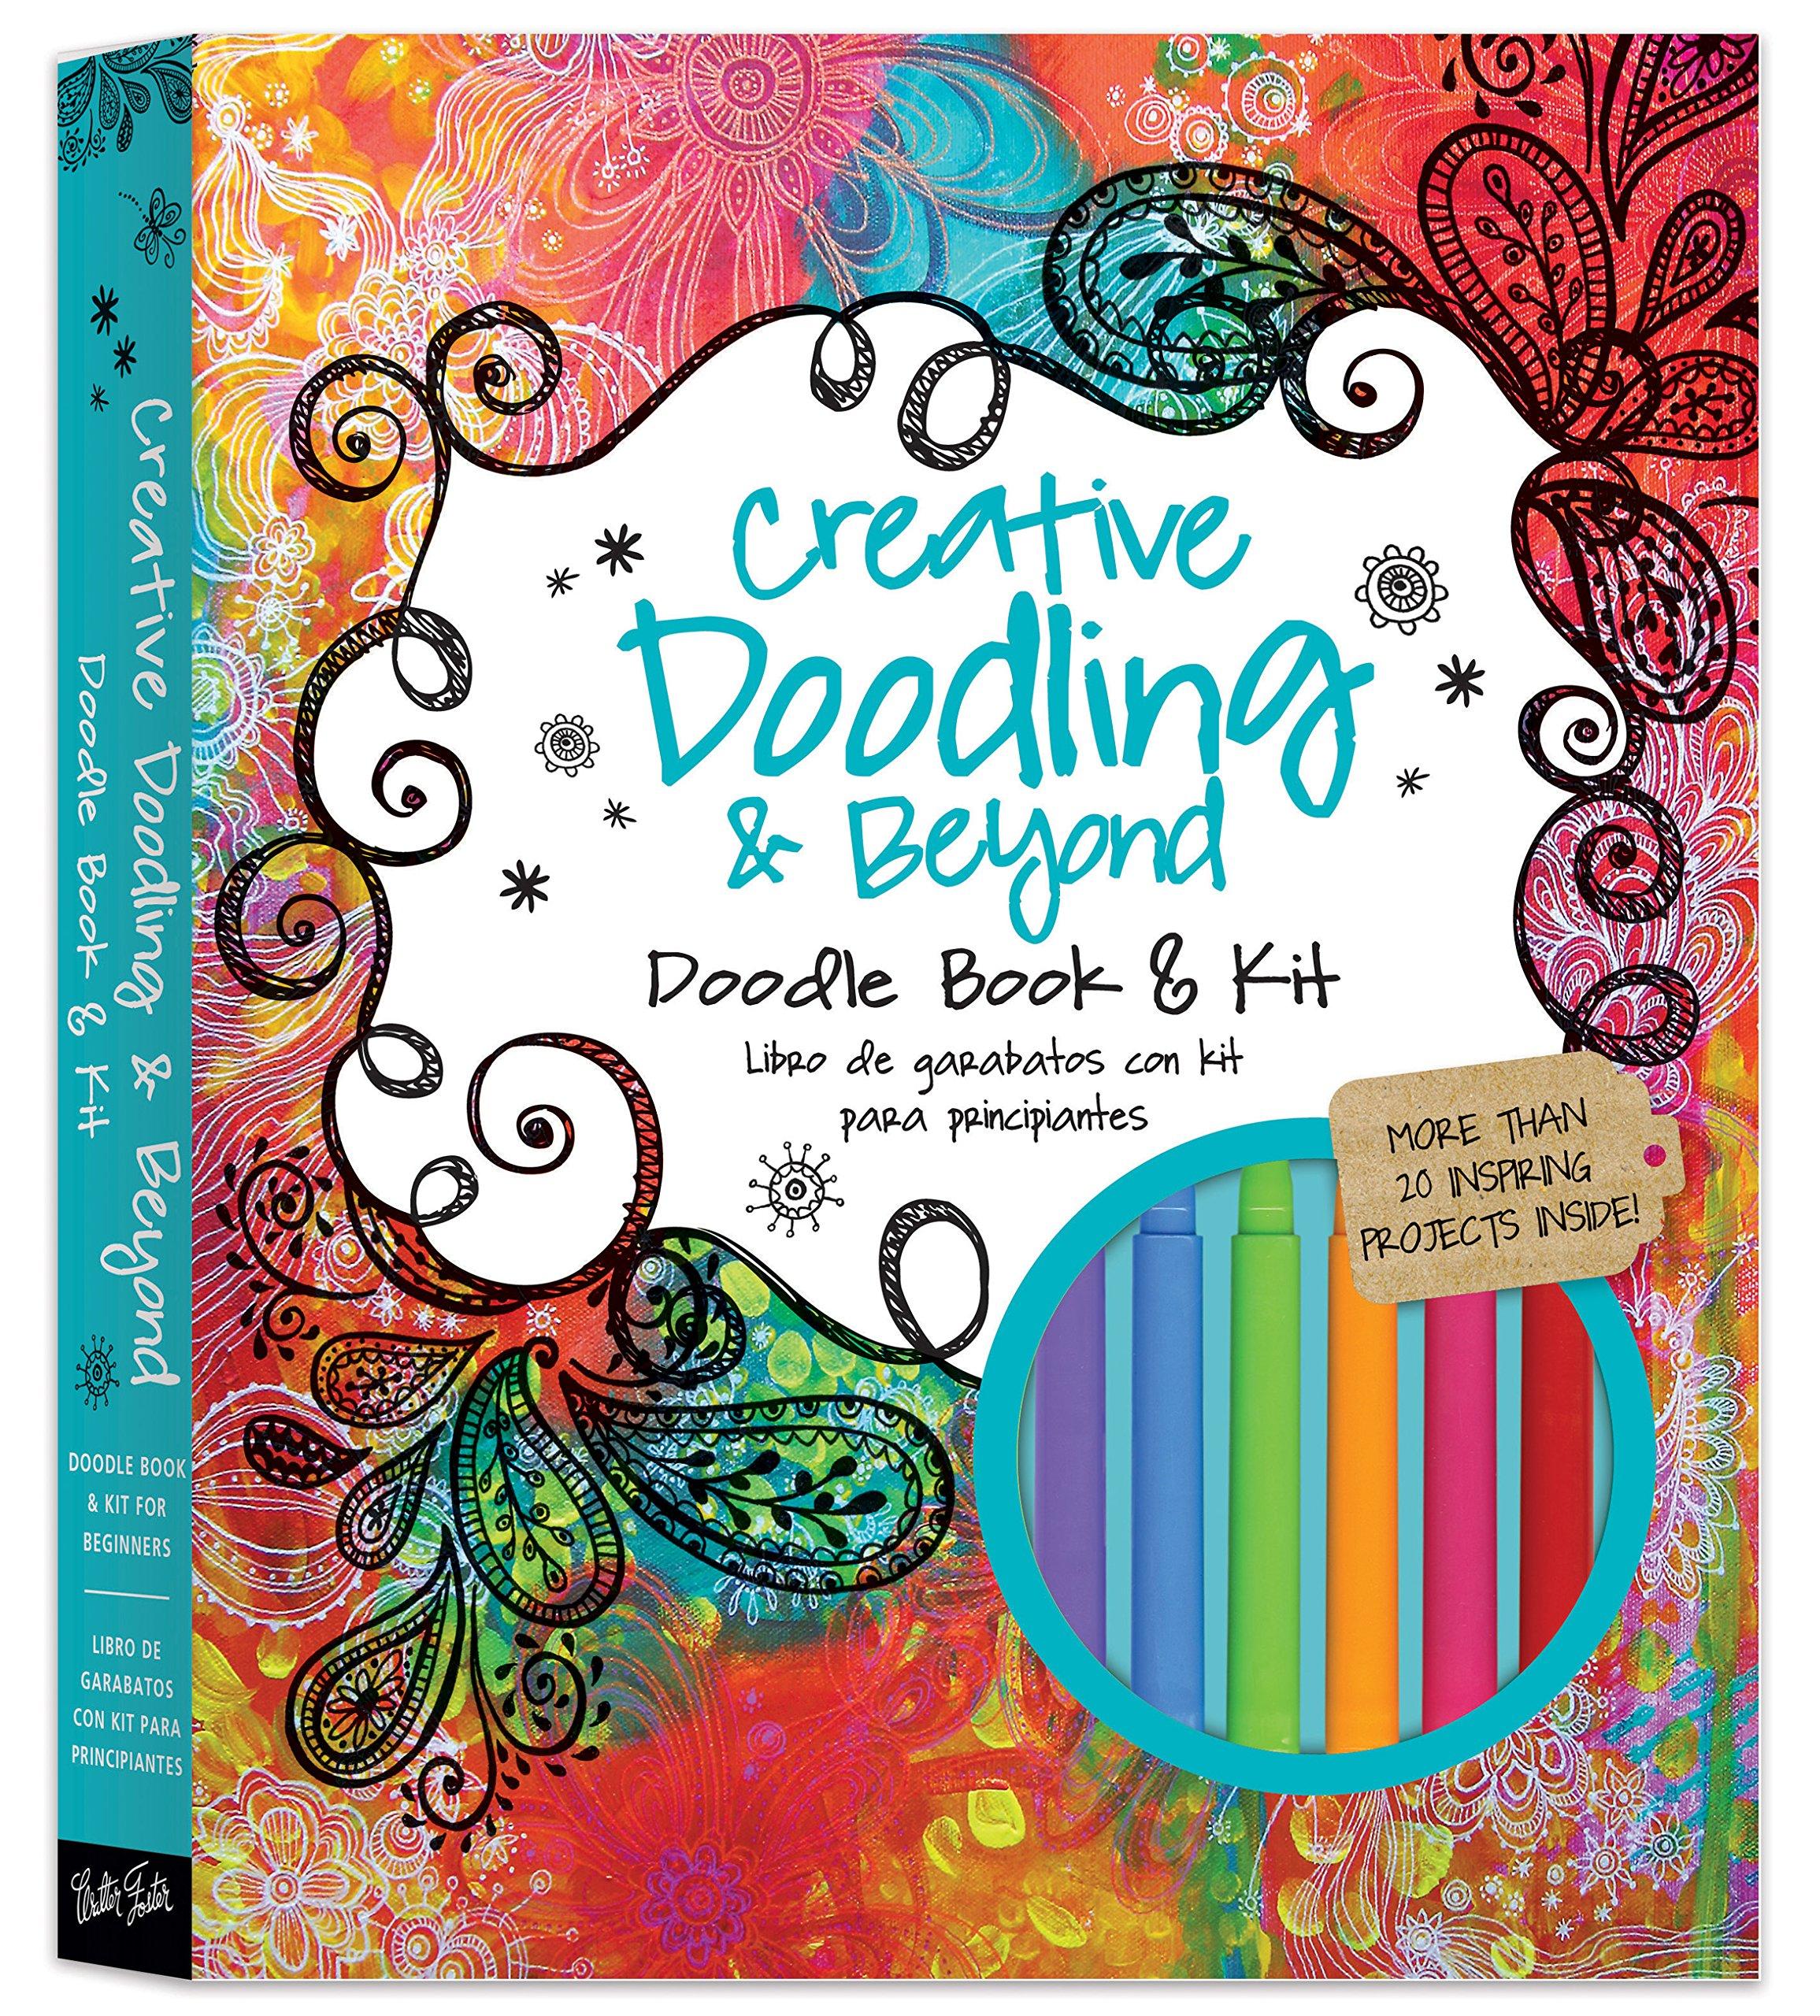 Buy Creative Doodling & Beyond Doodle Book & Kit More